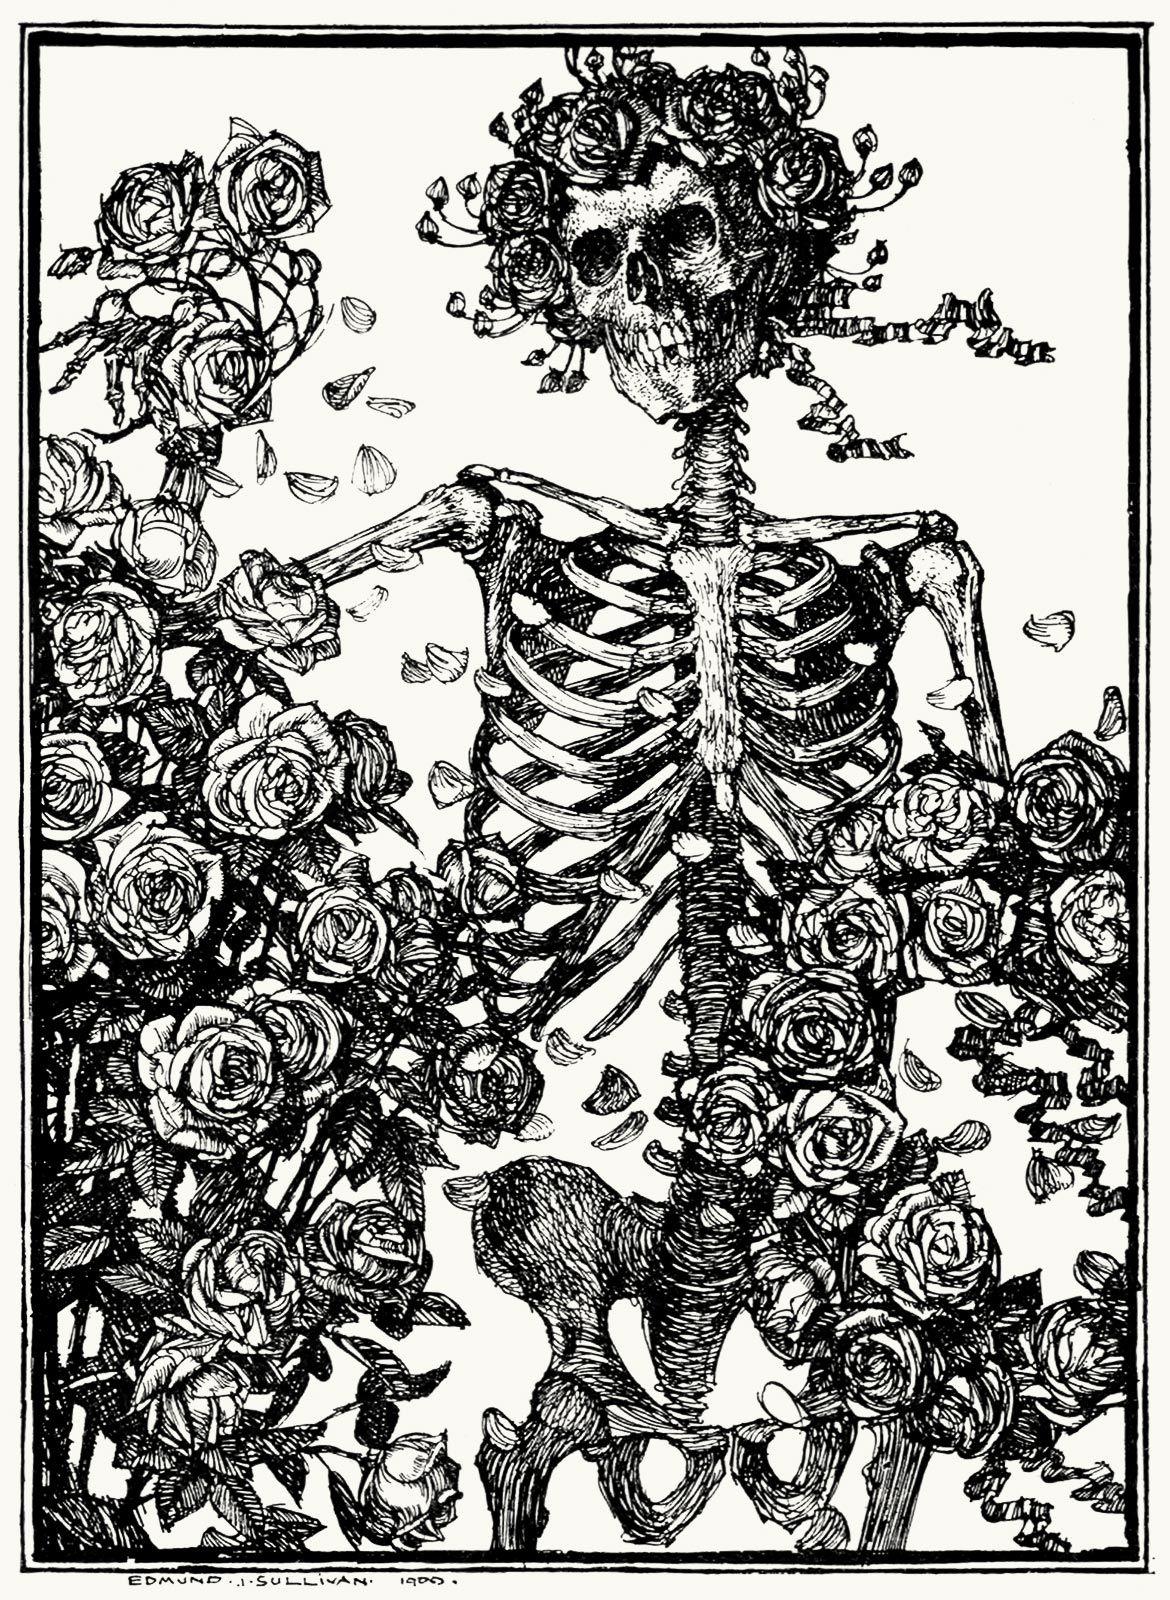 grateful dead self titledskull and bones from an illustration by edmund joseph sullivan for an old edition of the rubaiyat of omar khayyam - Grateful Dead Coloring Book